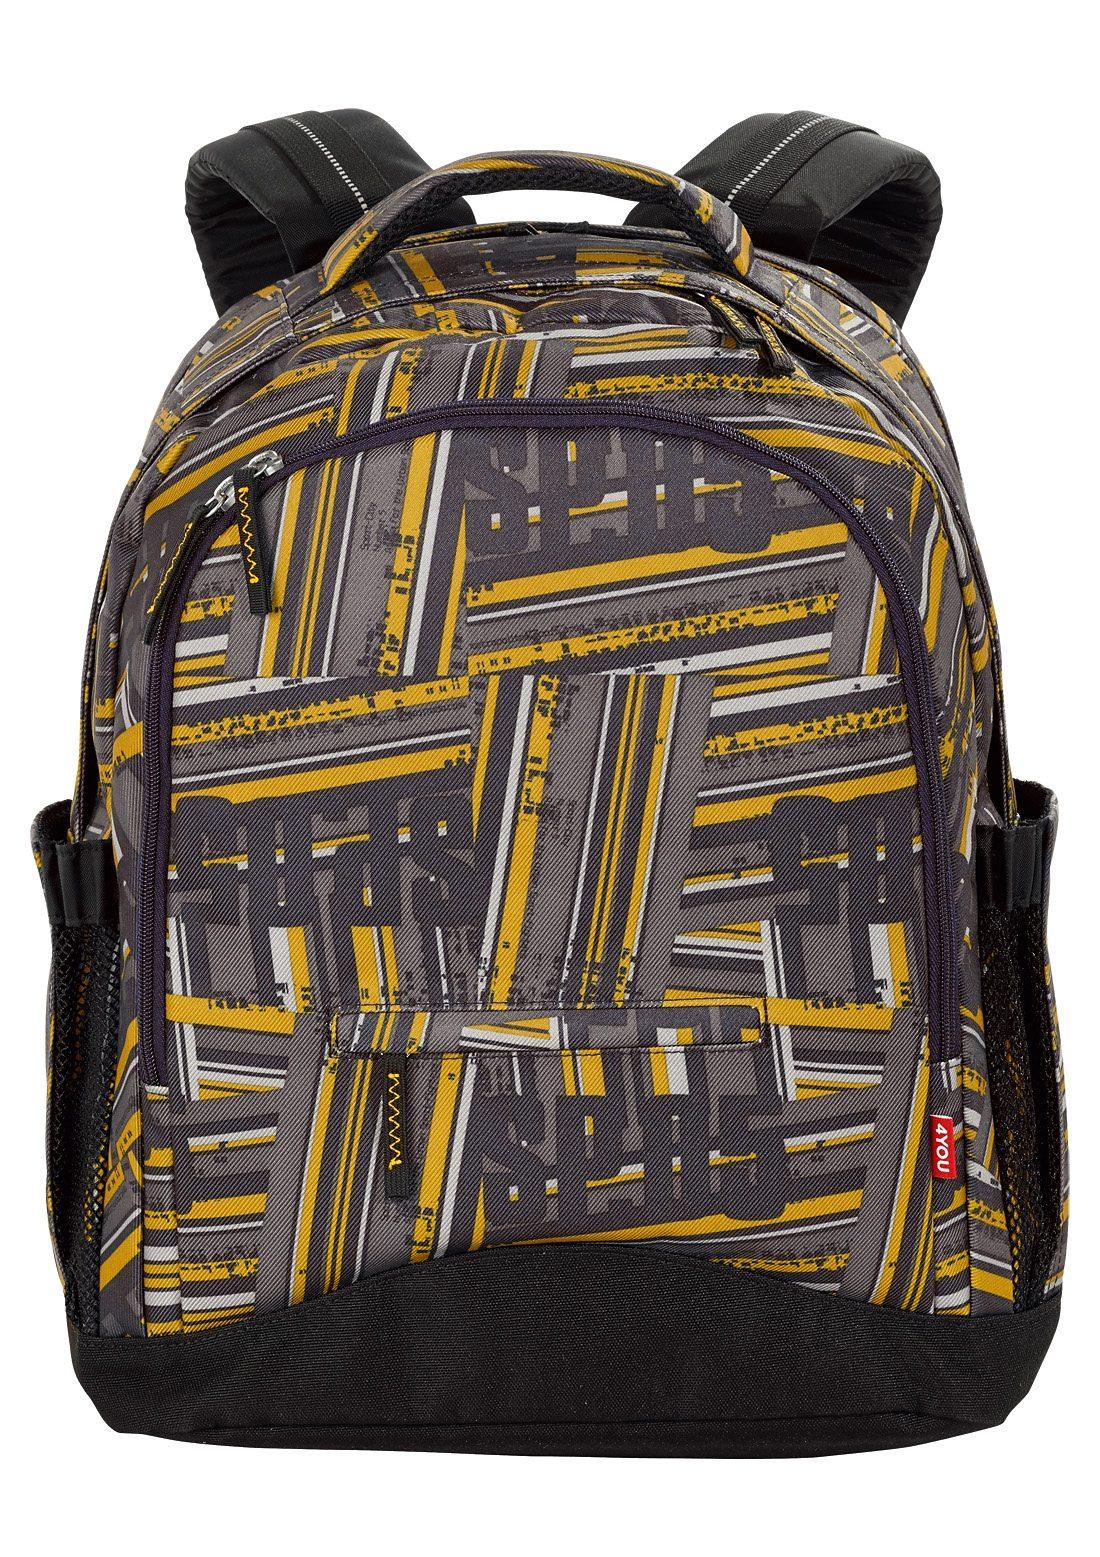 4YOU Schulrucksack mit Laptopfach, Stripes, »Compact«